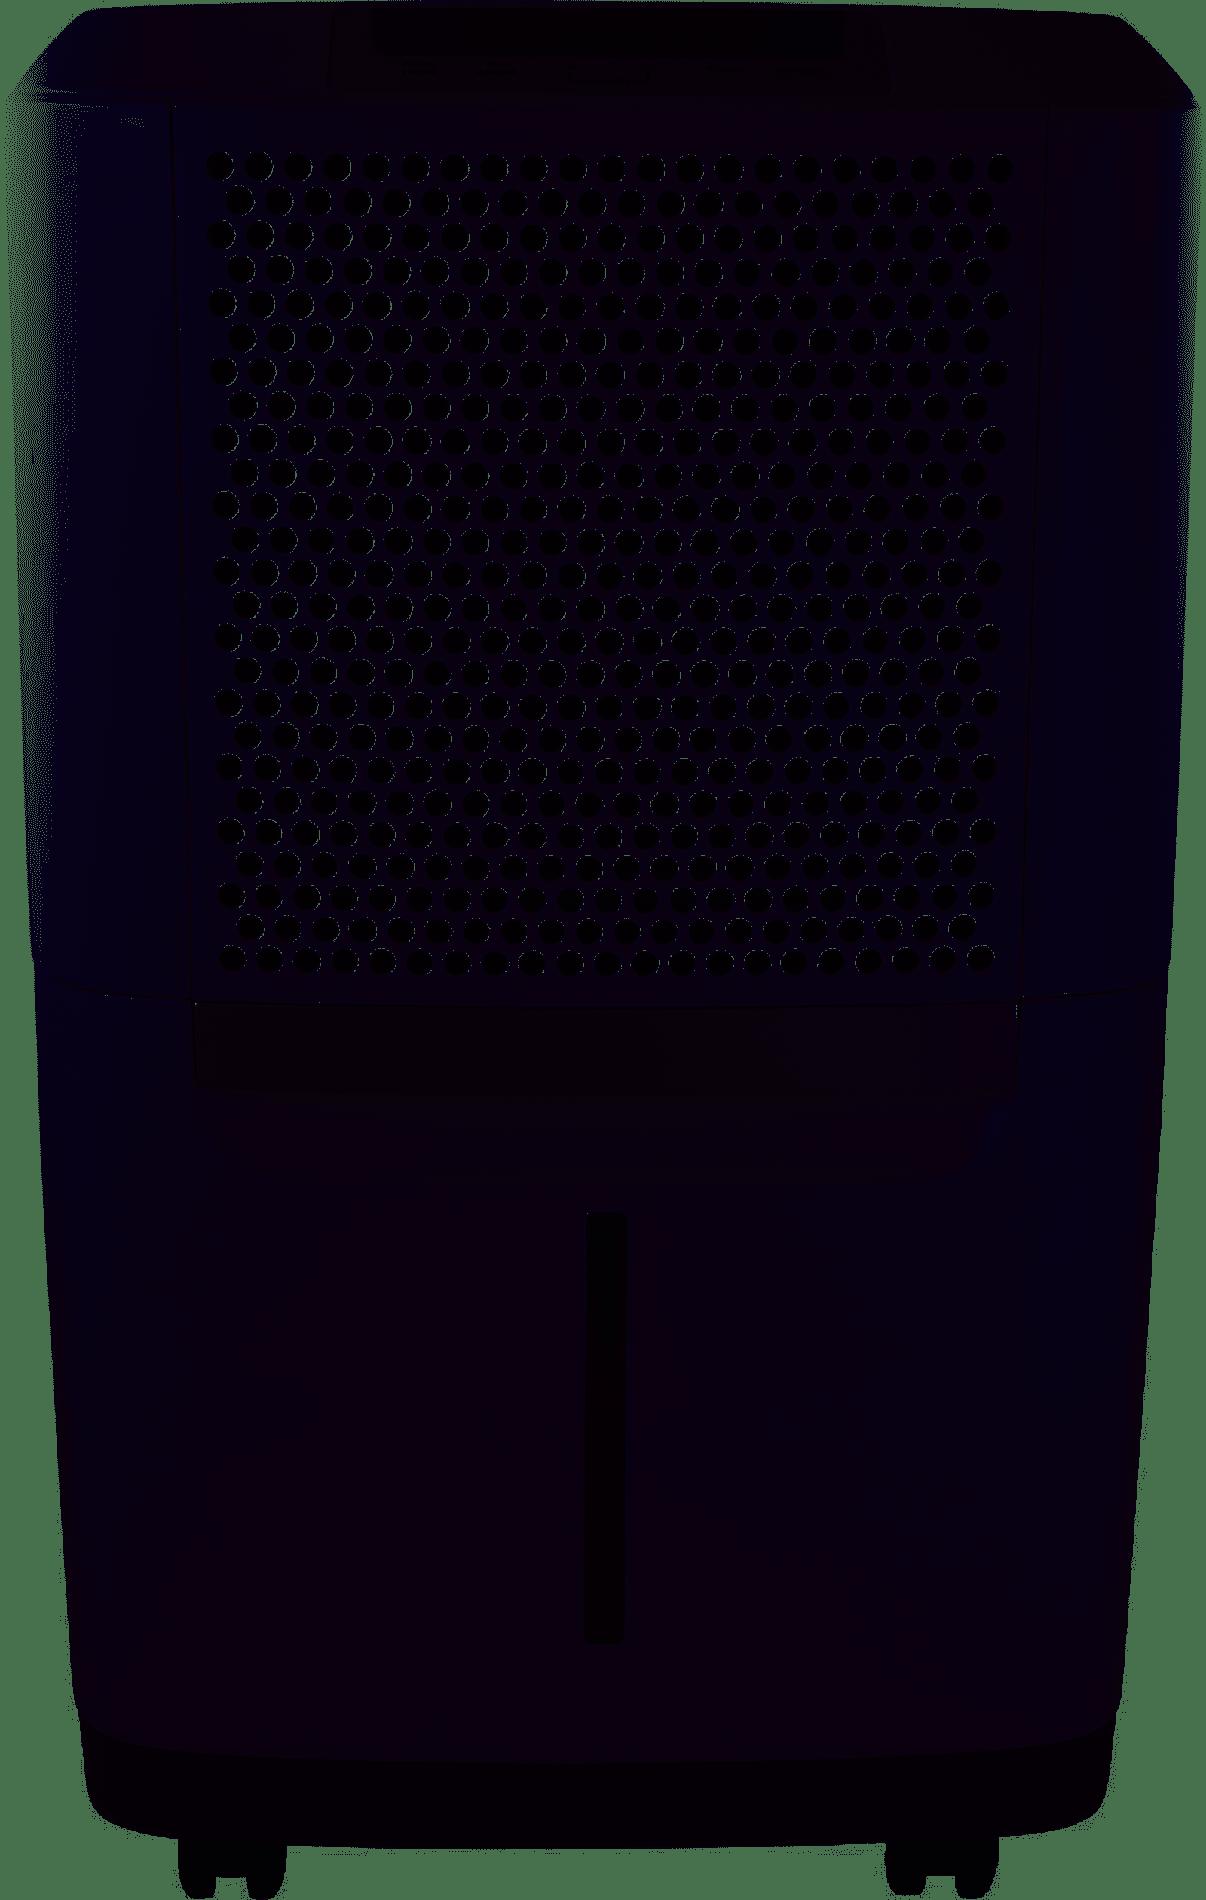 Frigidaire FAD704DWD 70 Pint Dehumidifier